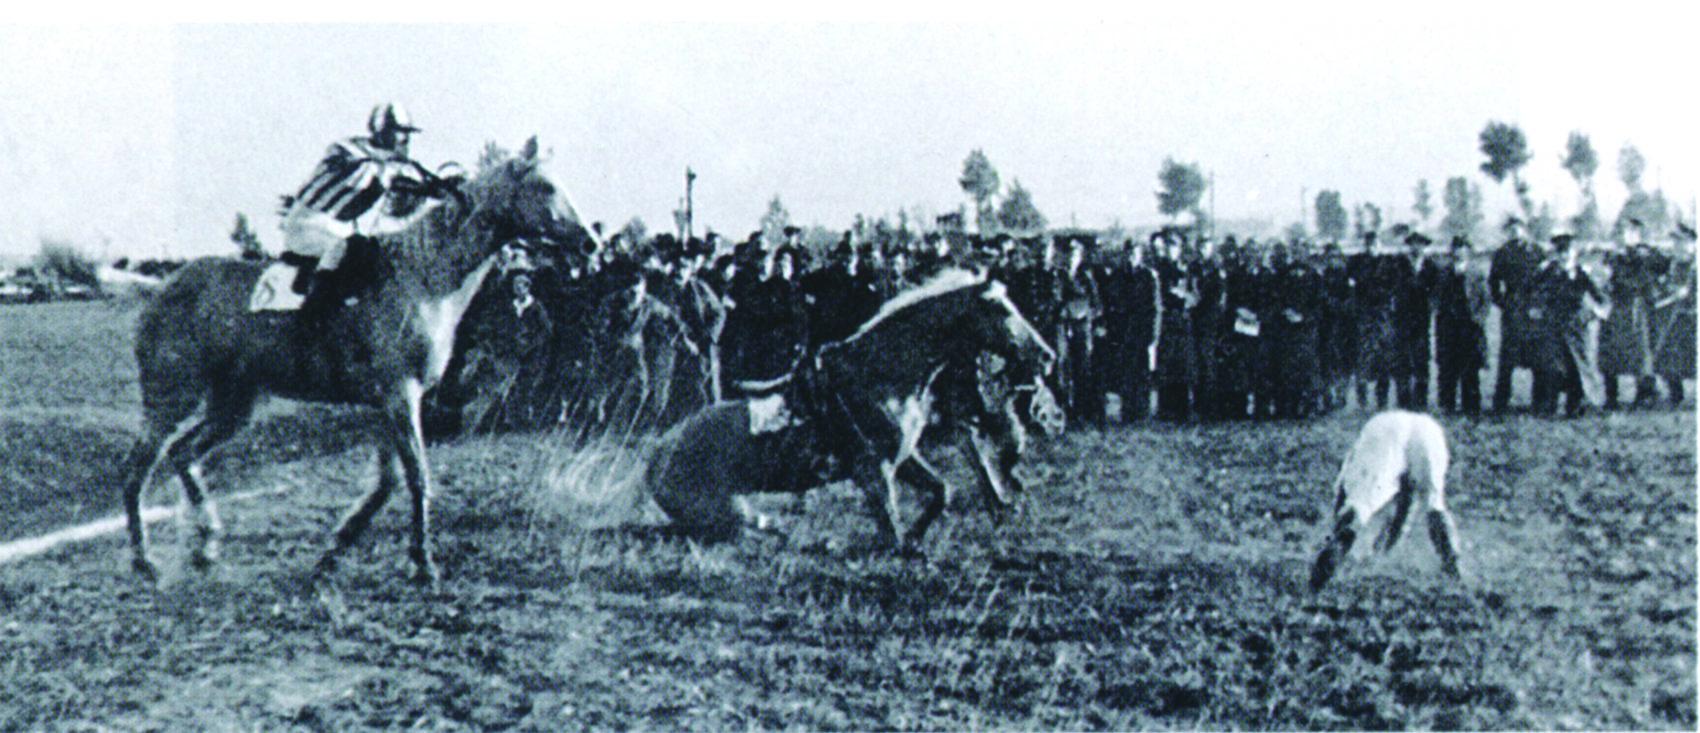 Lata (far left), riding Norma, successfully negotiates a water obstacle in the 1937 Velká Pardubická. (Courtesy ?eska Televise)